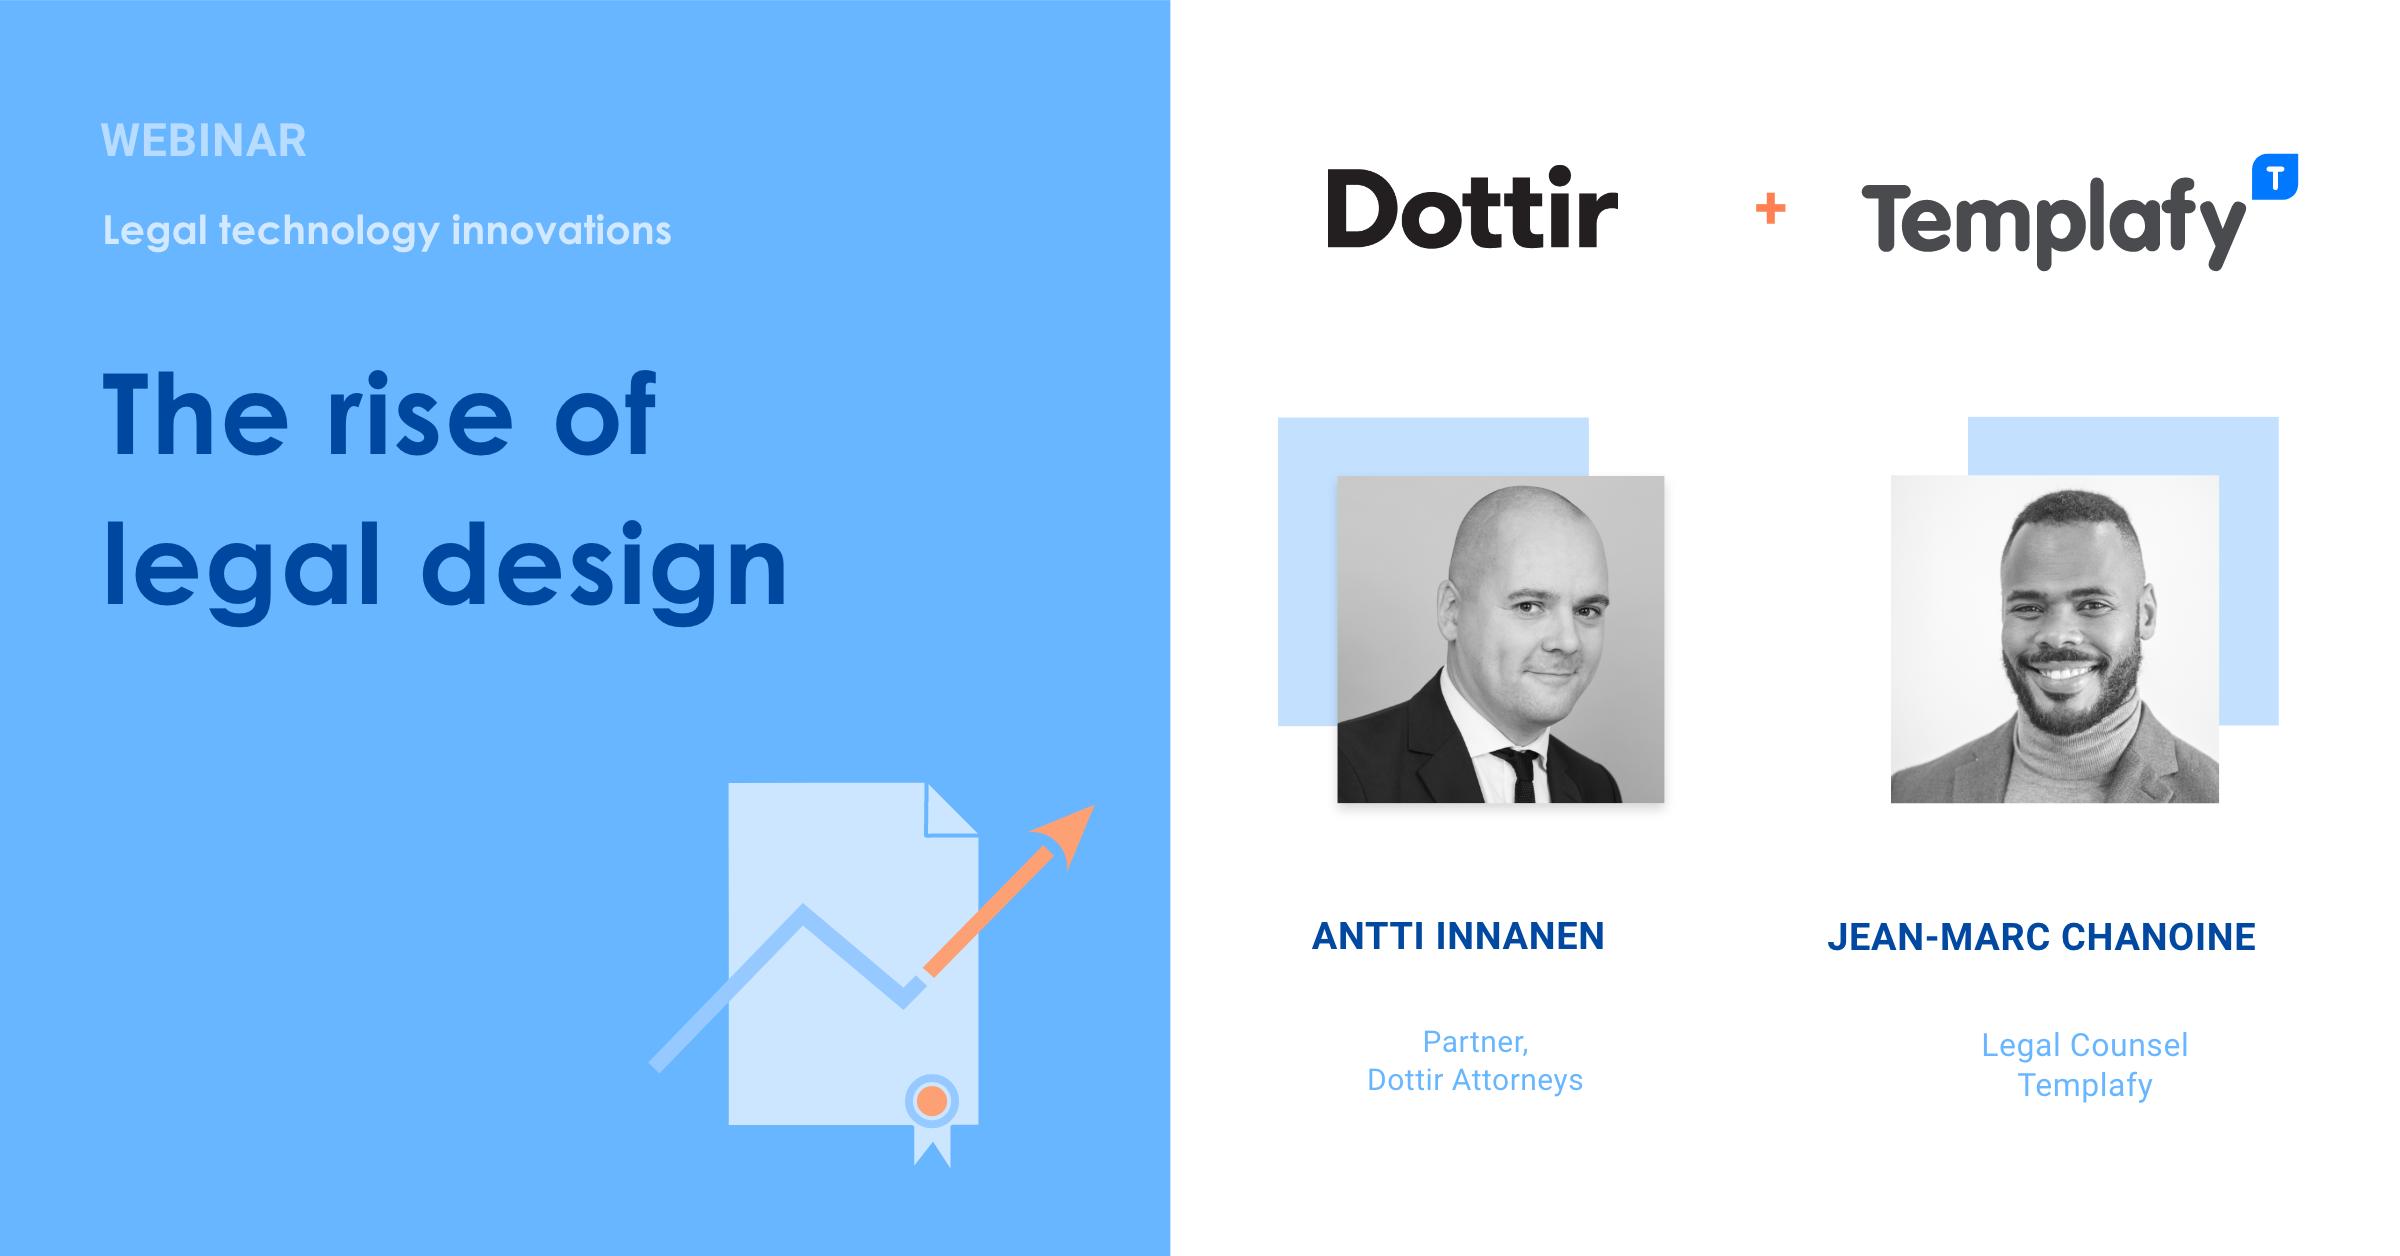 legal_design_rise_linkedin01